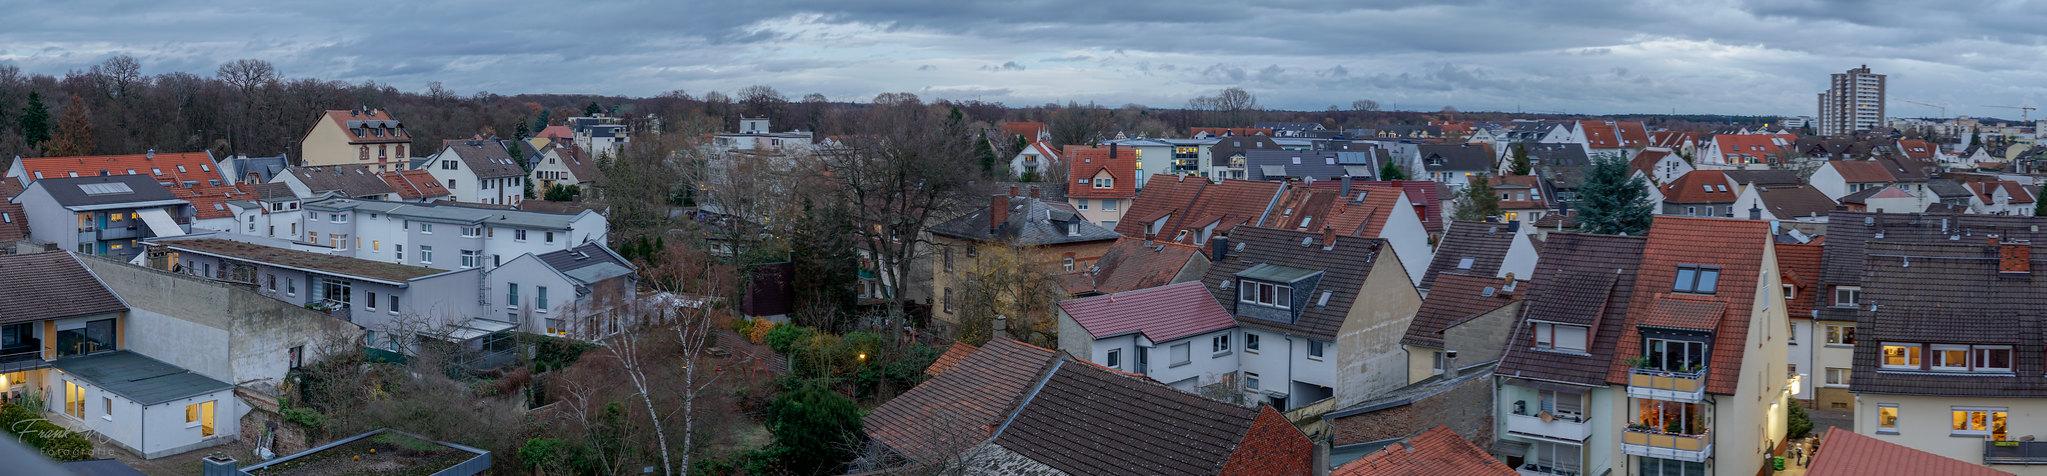 panorama_ausblick.marktplatzkirche08122018b